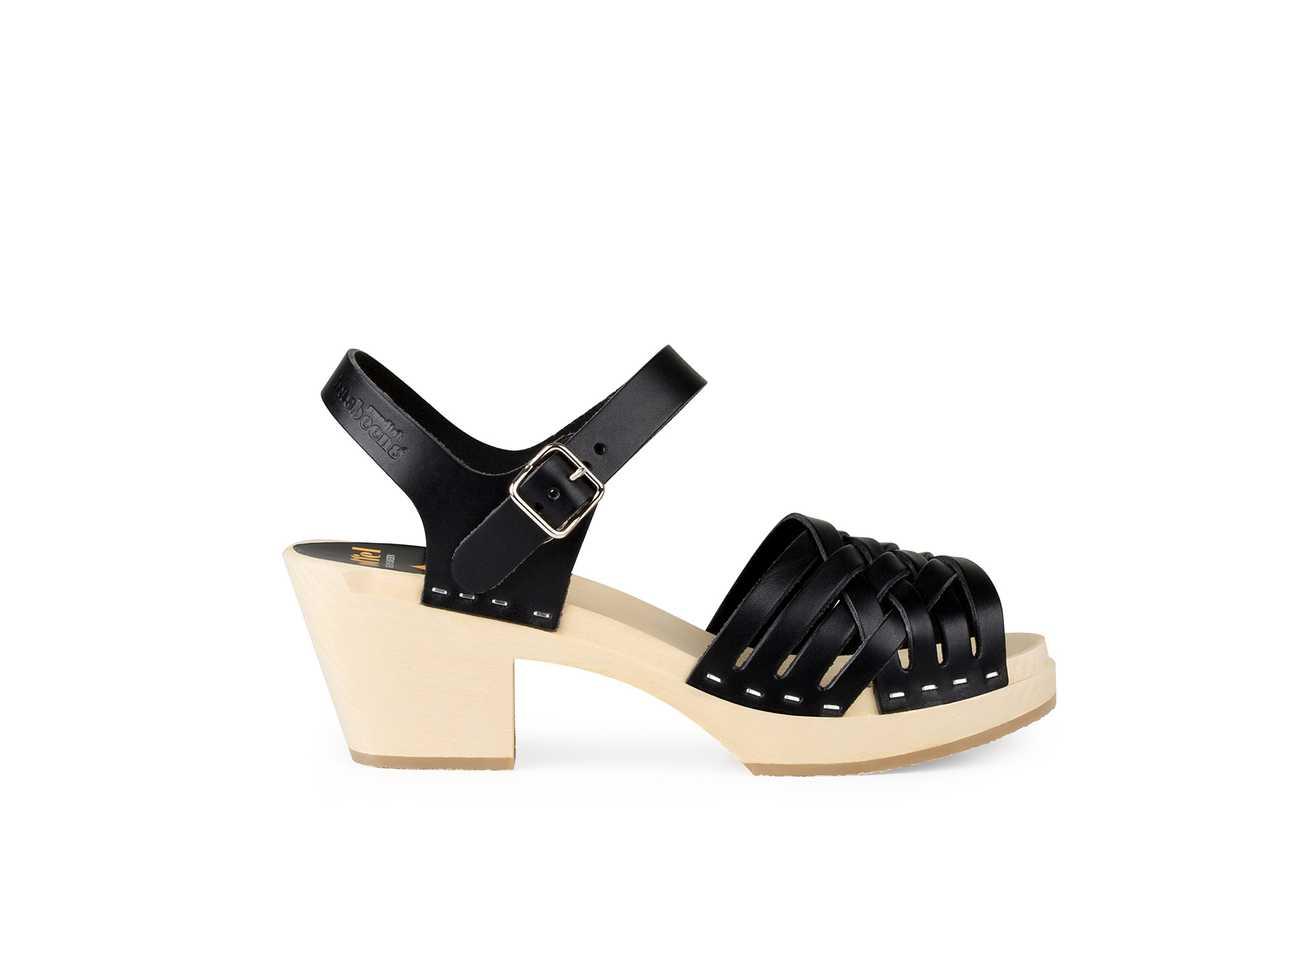 Braided High Black/Nature sole